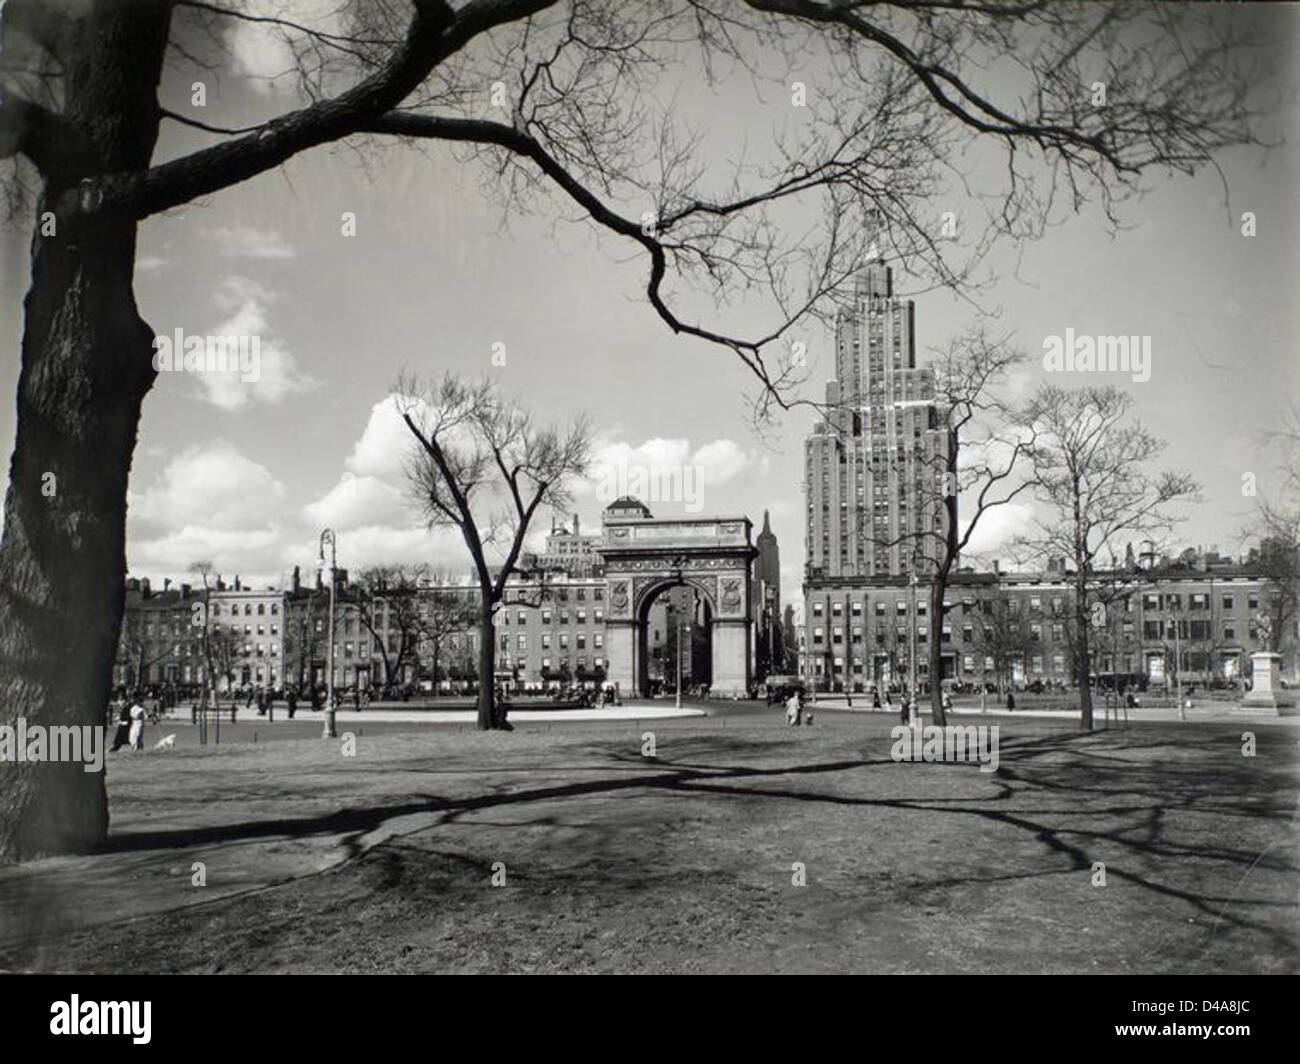 Washington Square looking north, Manhattan. - Stock Image